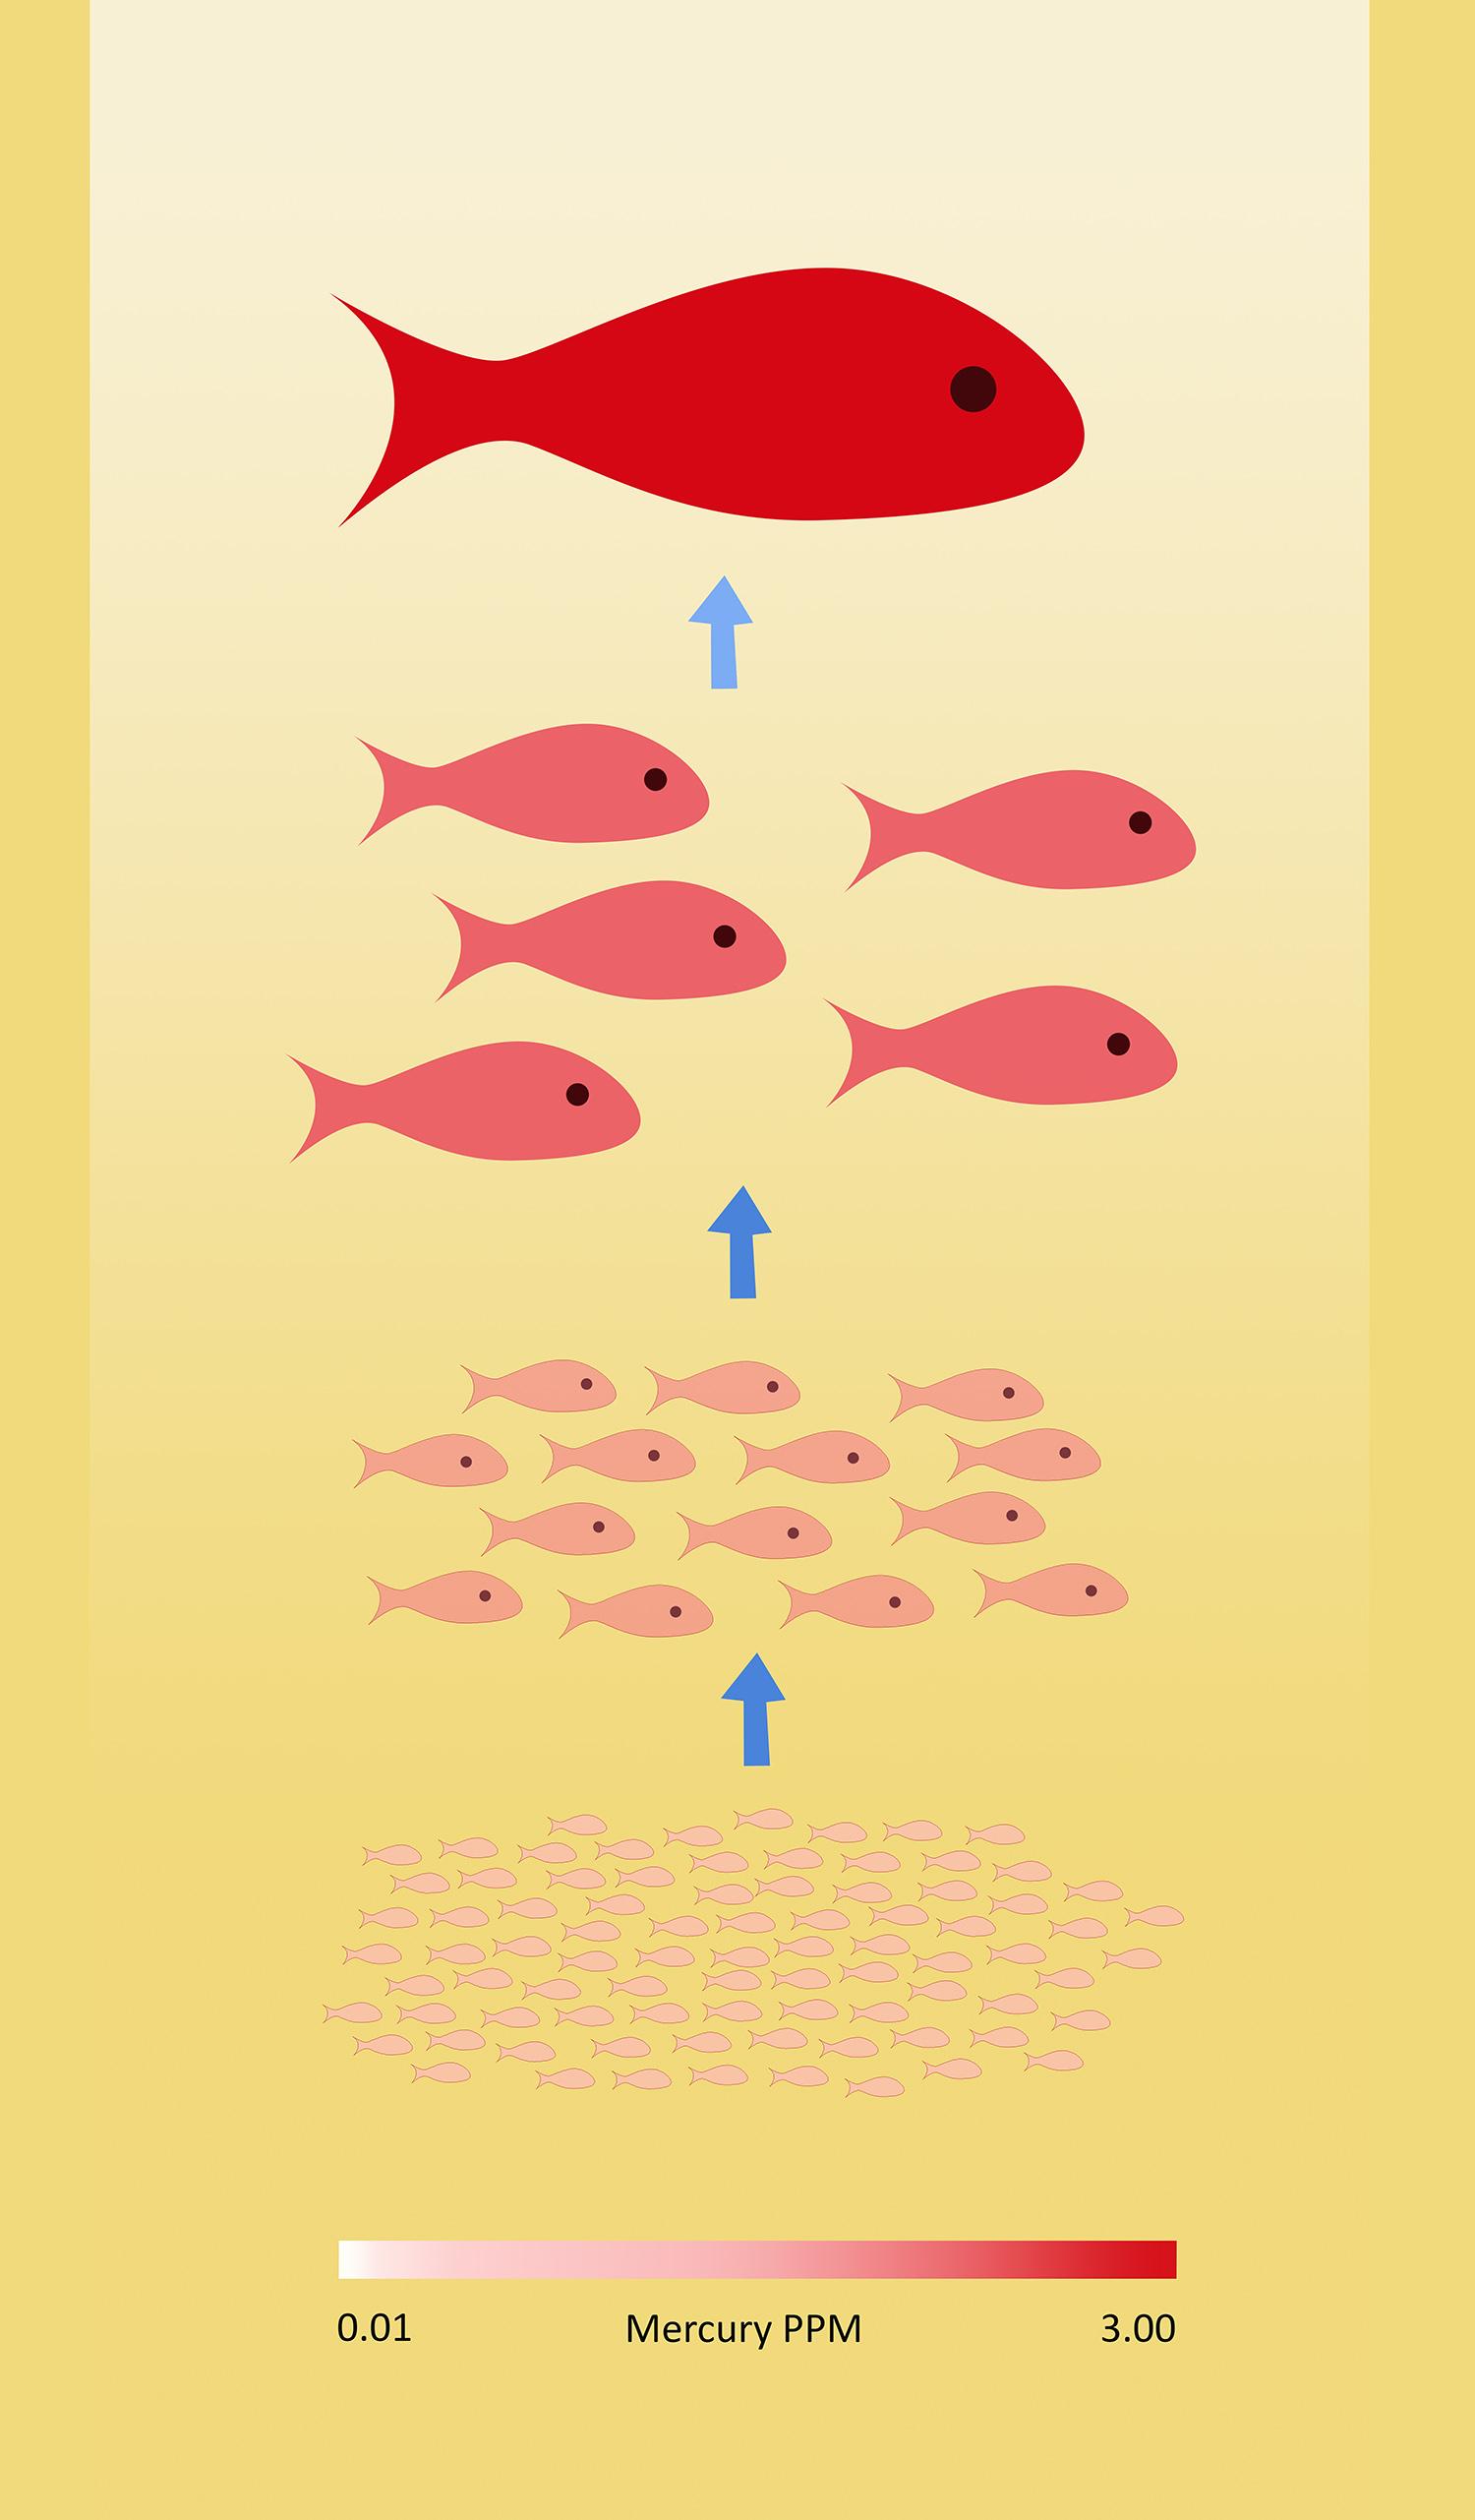 Bioaccumulation of mercury in the marine food chain